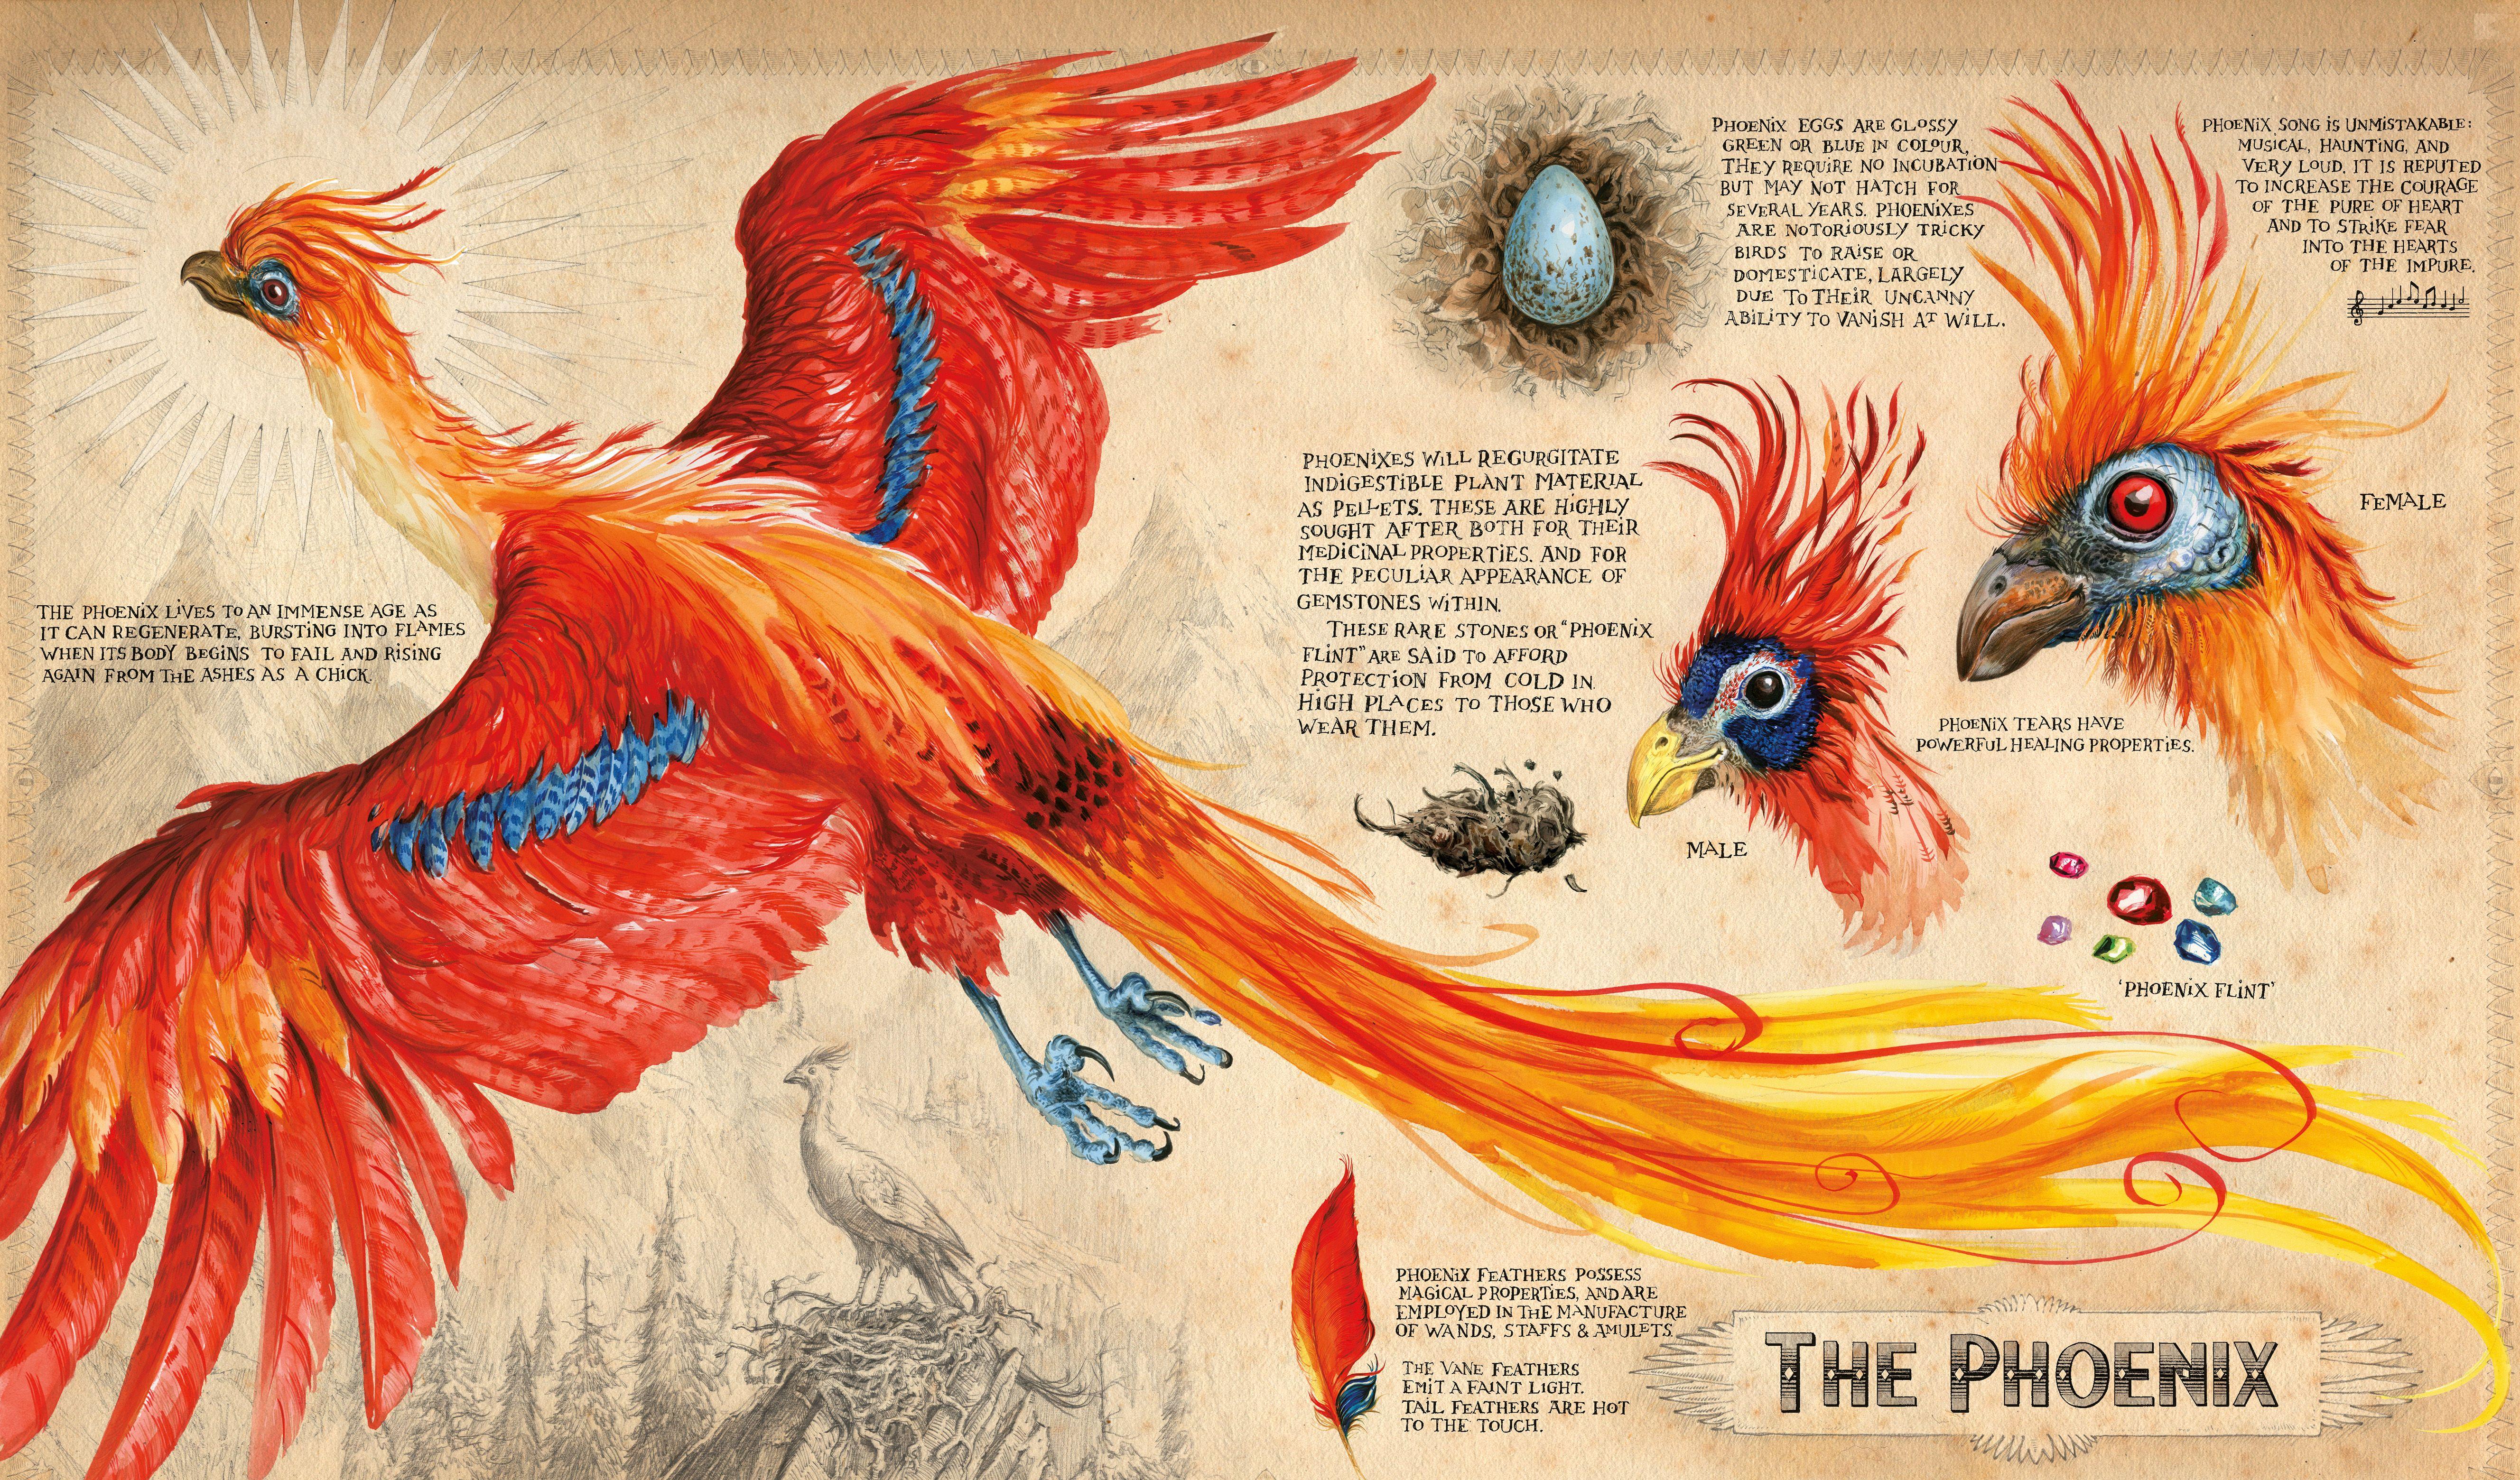 Phoenix Artwork From Harry Potter And The Chamber Of Secrets Jim Kay Jpg 5311 3120 Phantastische Tierwesen Harry Potter Thema Harry Potter Bucher